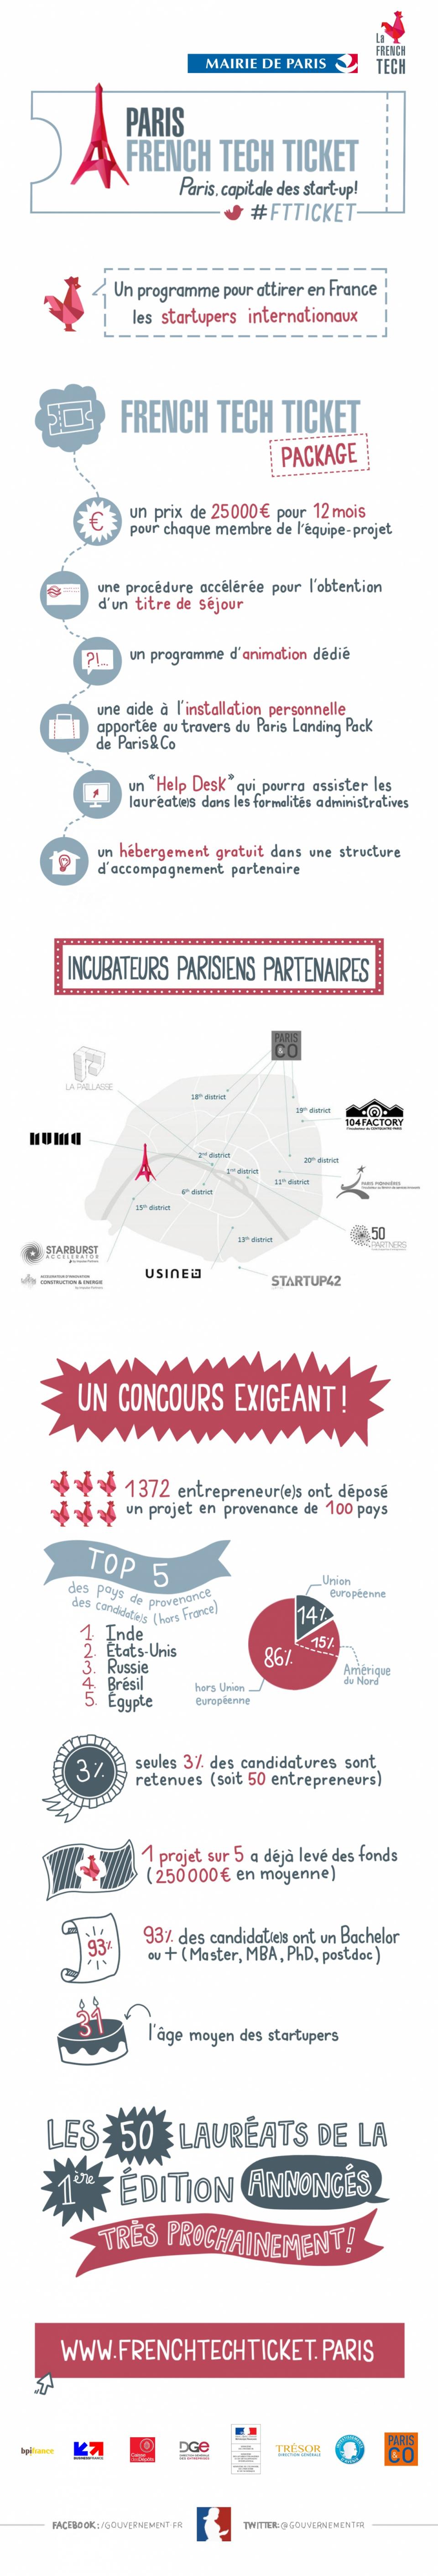 Infographie : French Tech Ticket - voir en plus grand